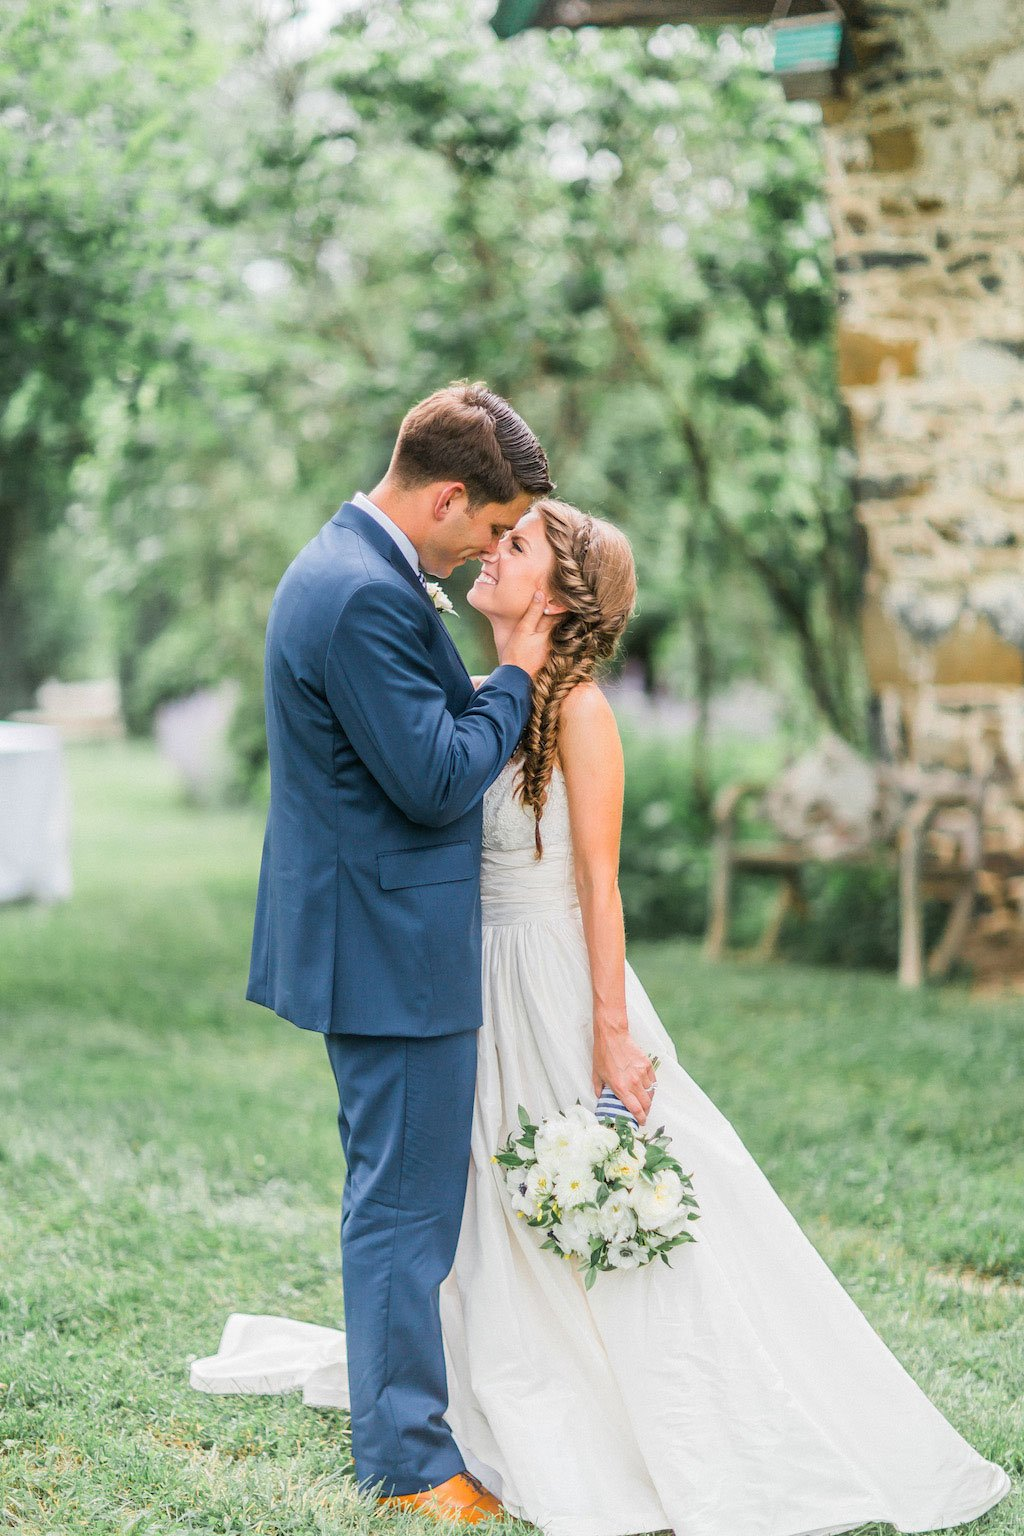 8-4-16-white-rustic-modern-farm-wedding-virginia-15NEW